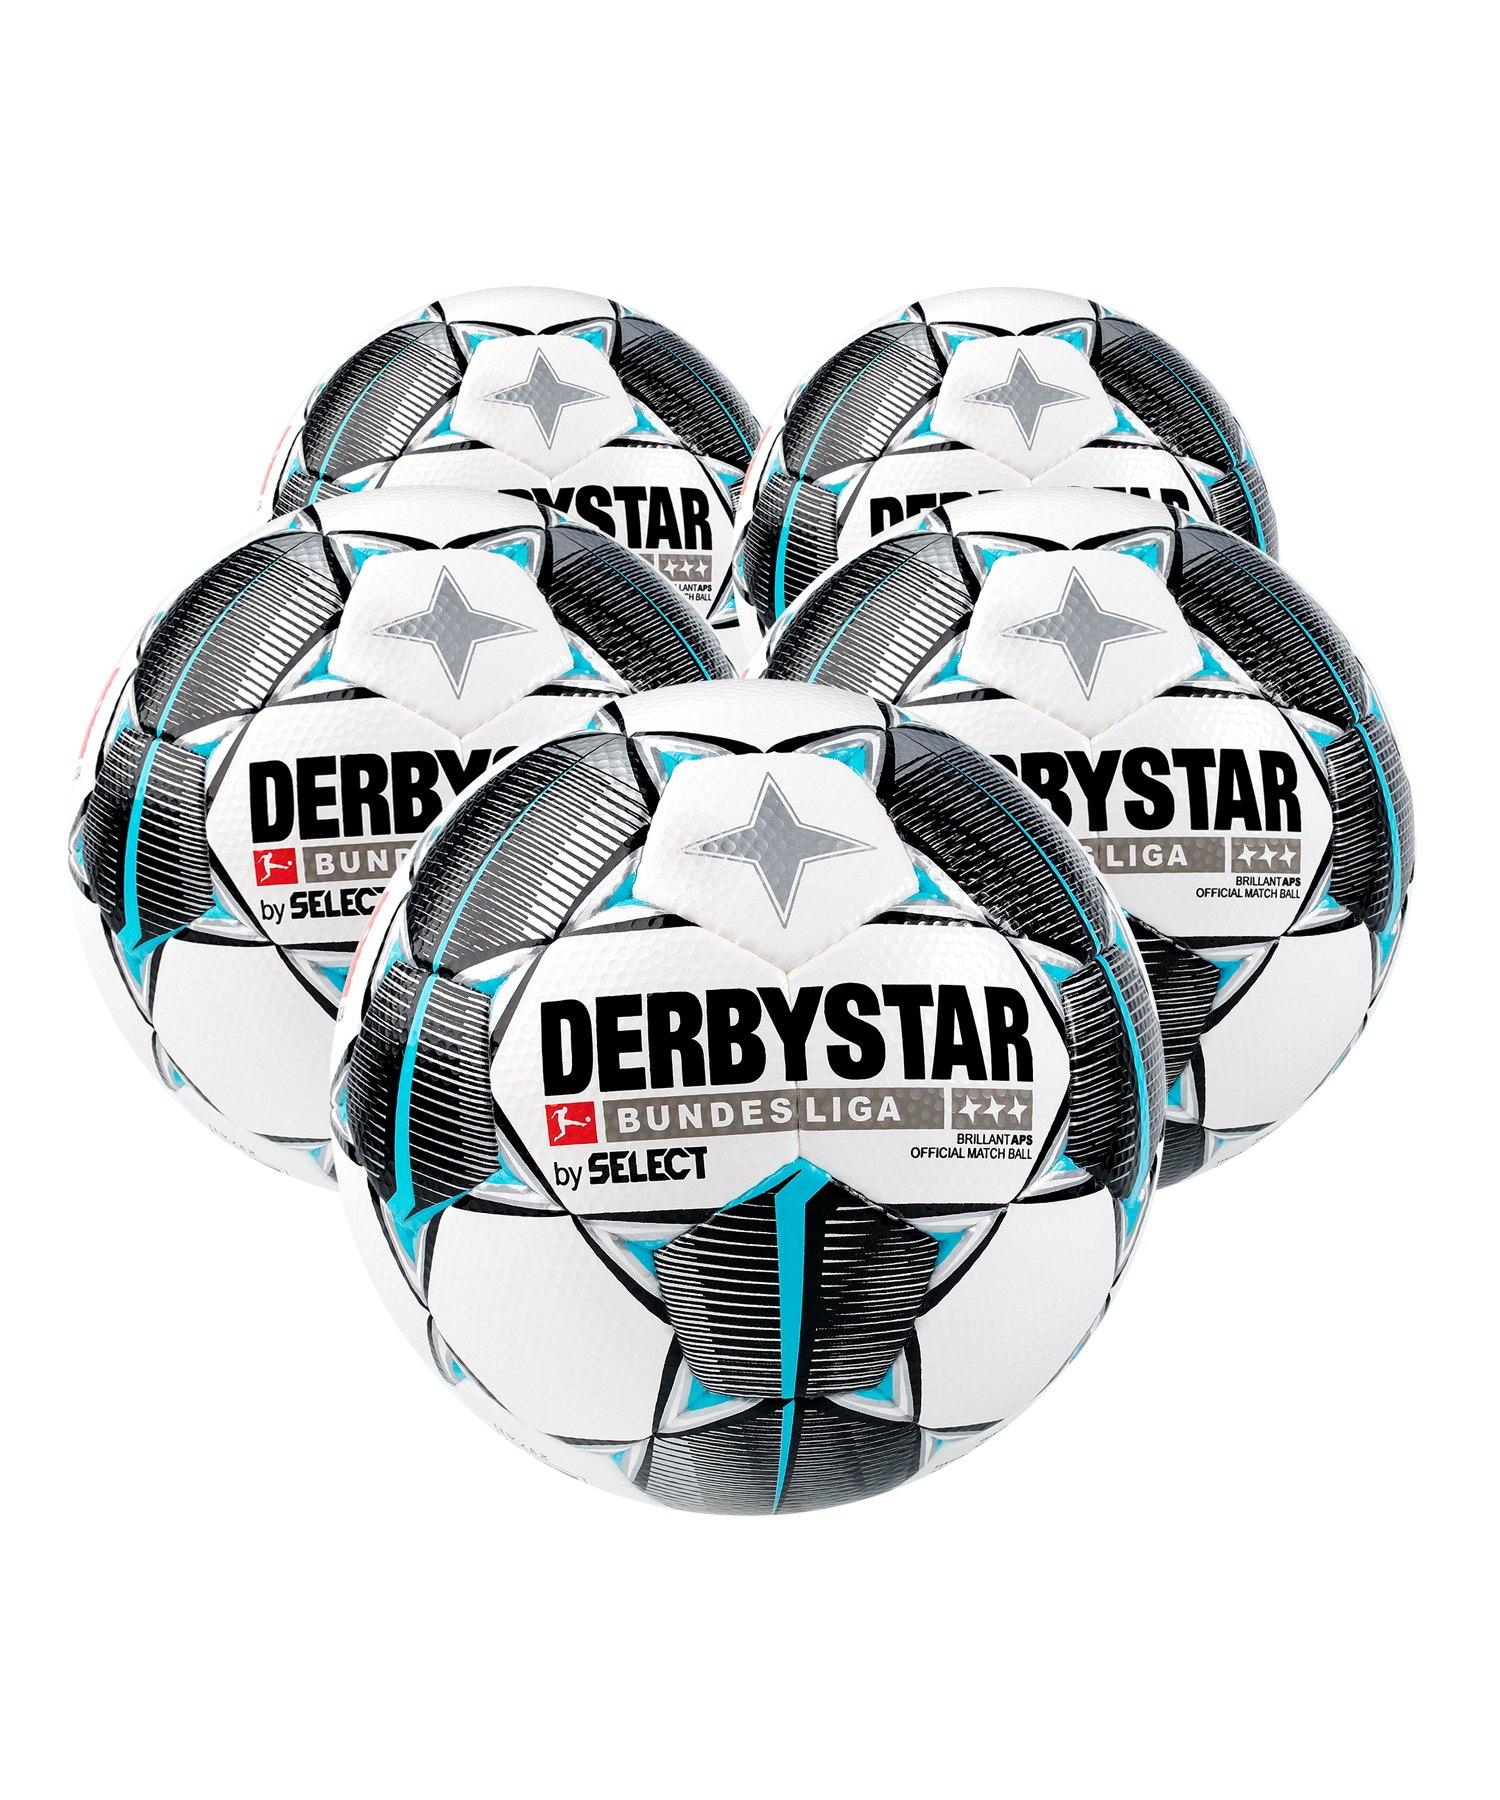 Derbystar Buli Bril APS Spielball 5x Gr.5 Weiss F019 - weiss